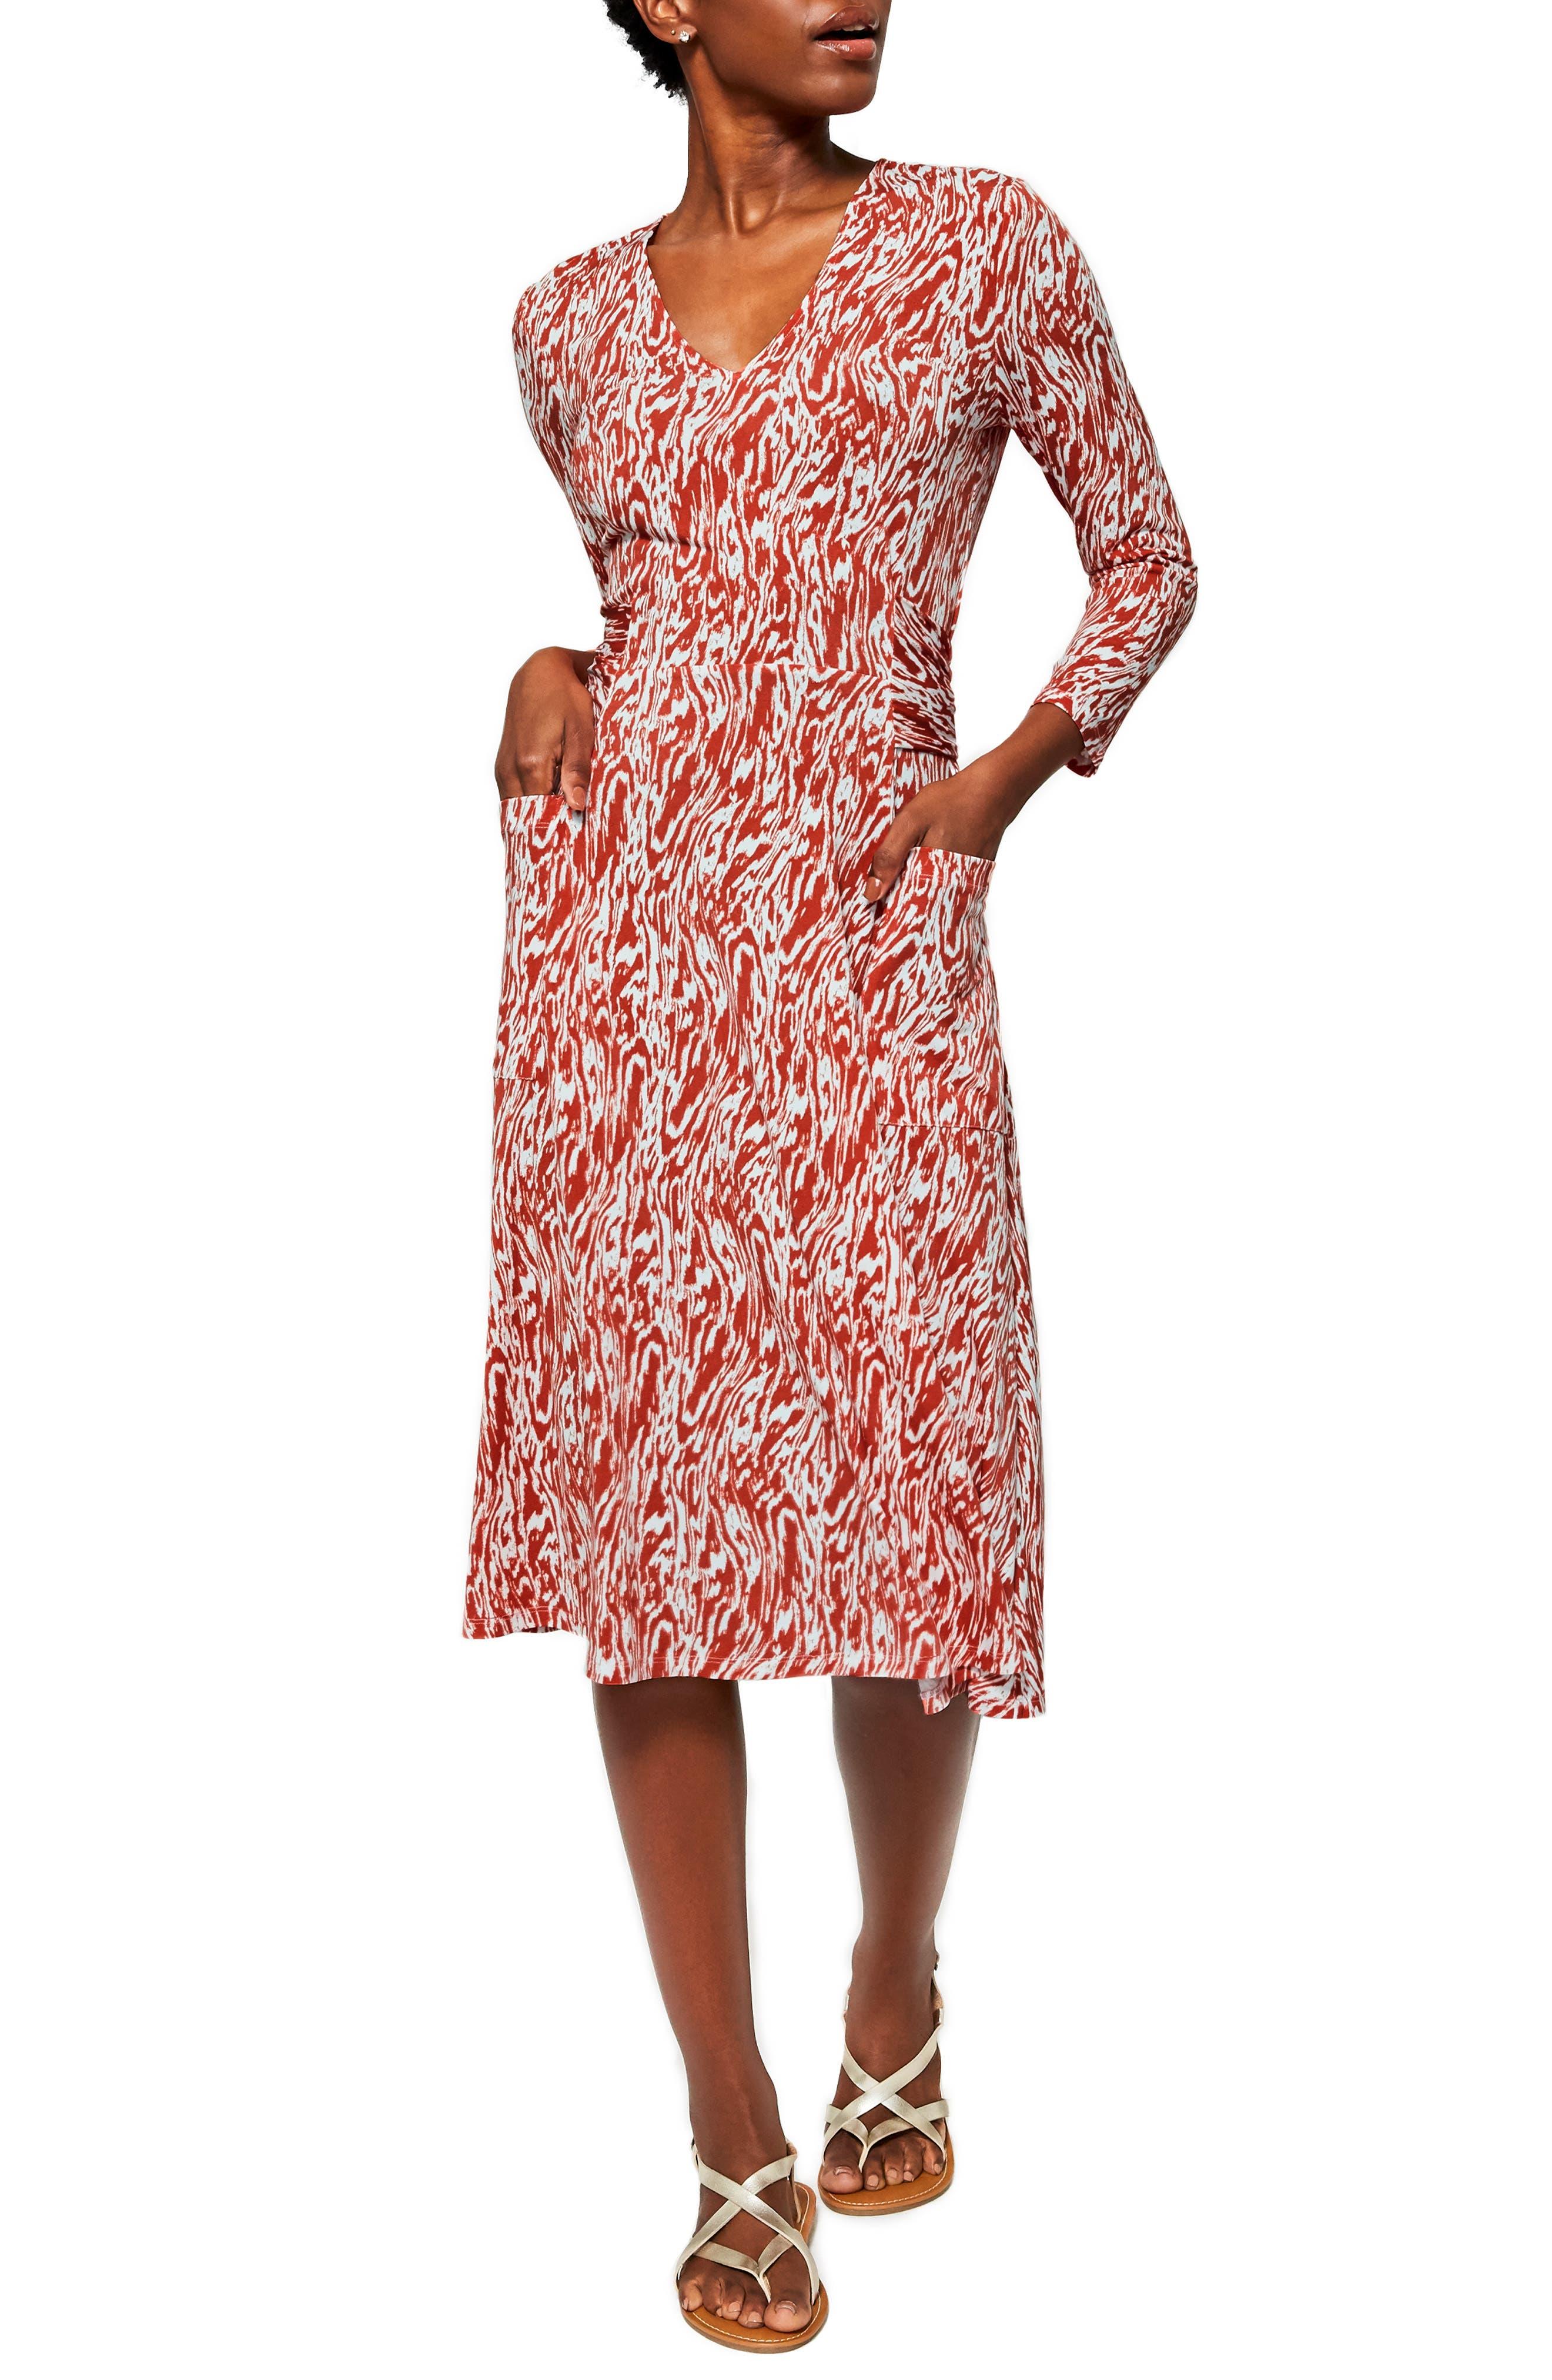 Eliza Long Sleeve V-Neck Midi Dress